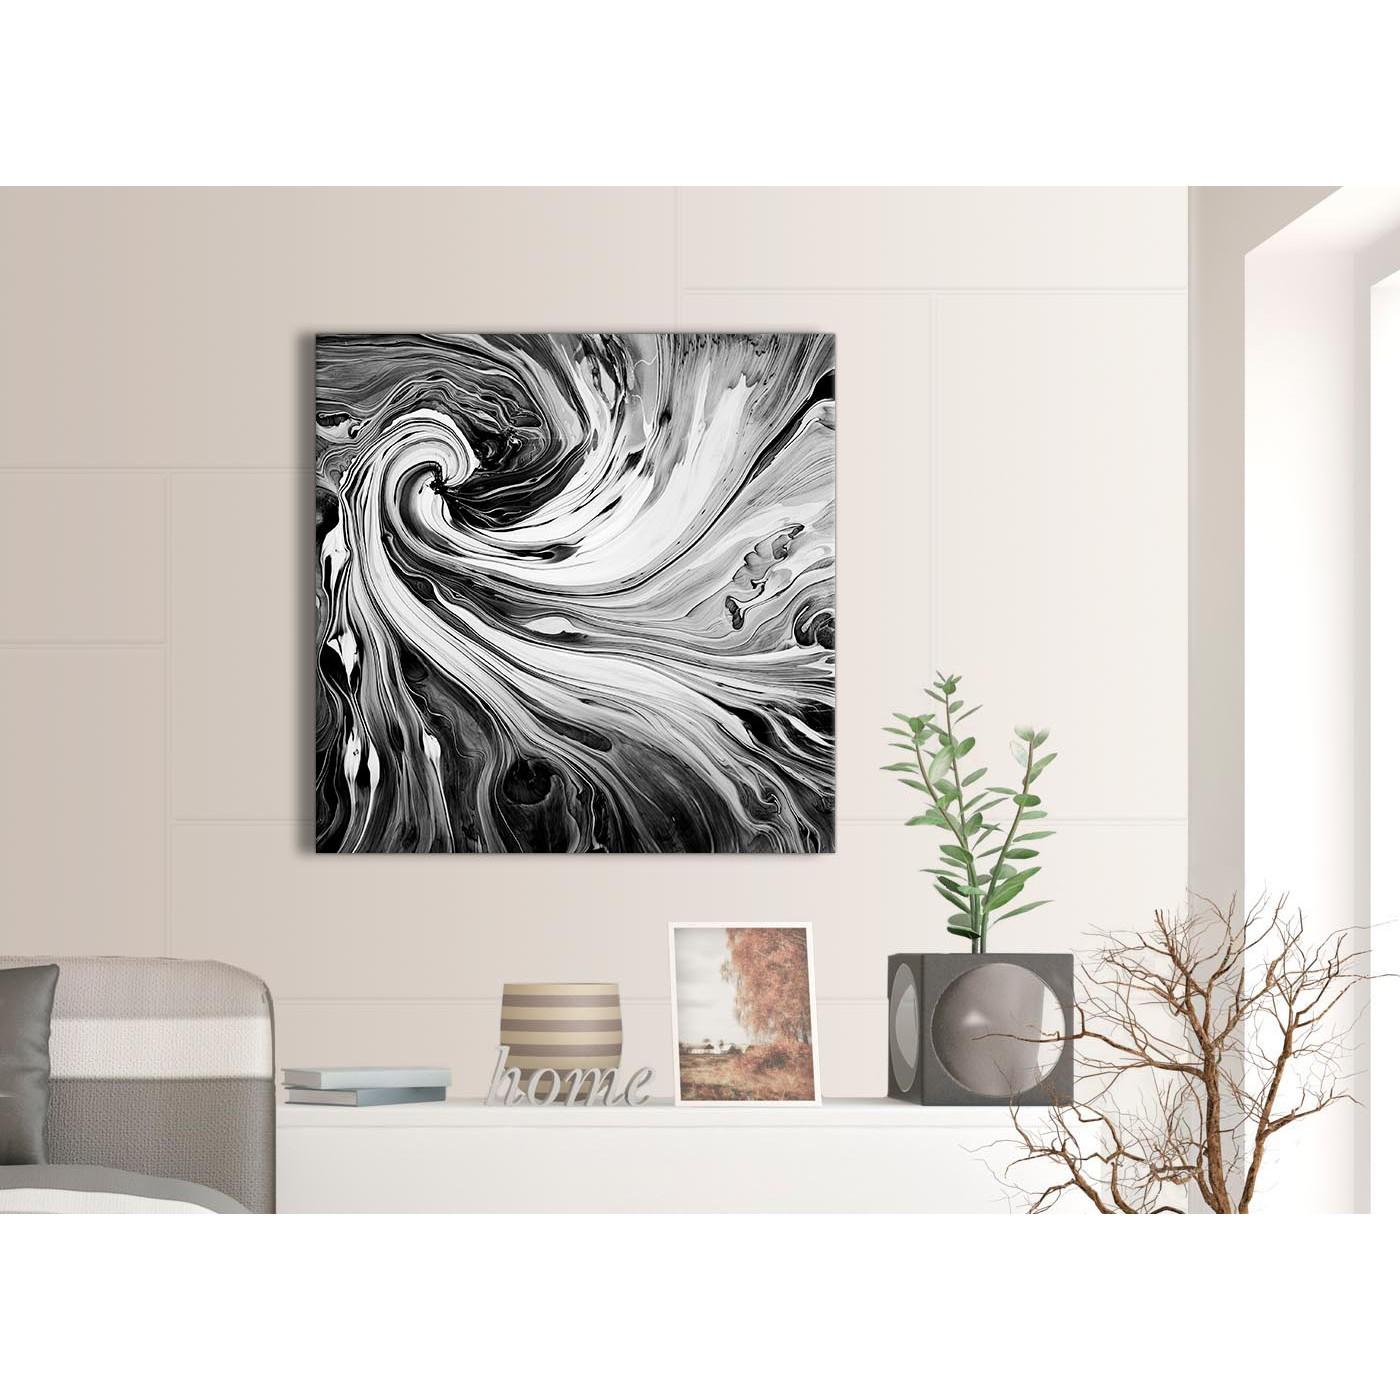 Black White Grey Swirls Modern Abstract Canvas Wall Art  sc 1 st  Elitflat & Black And White Wall Art Uk - Elitflat